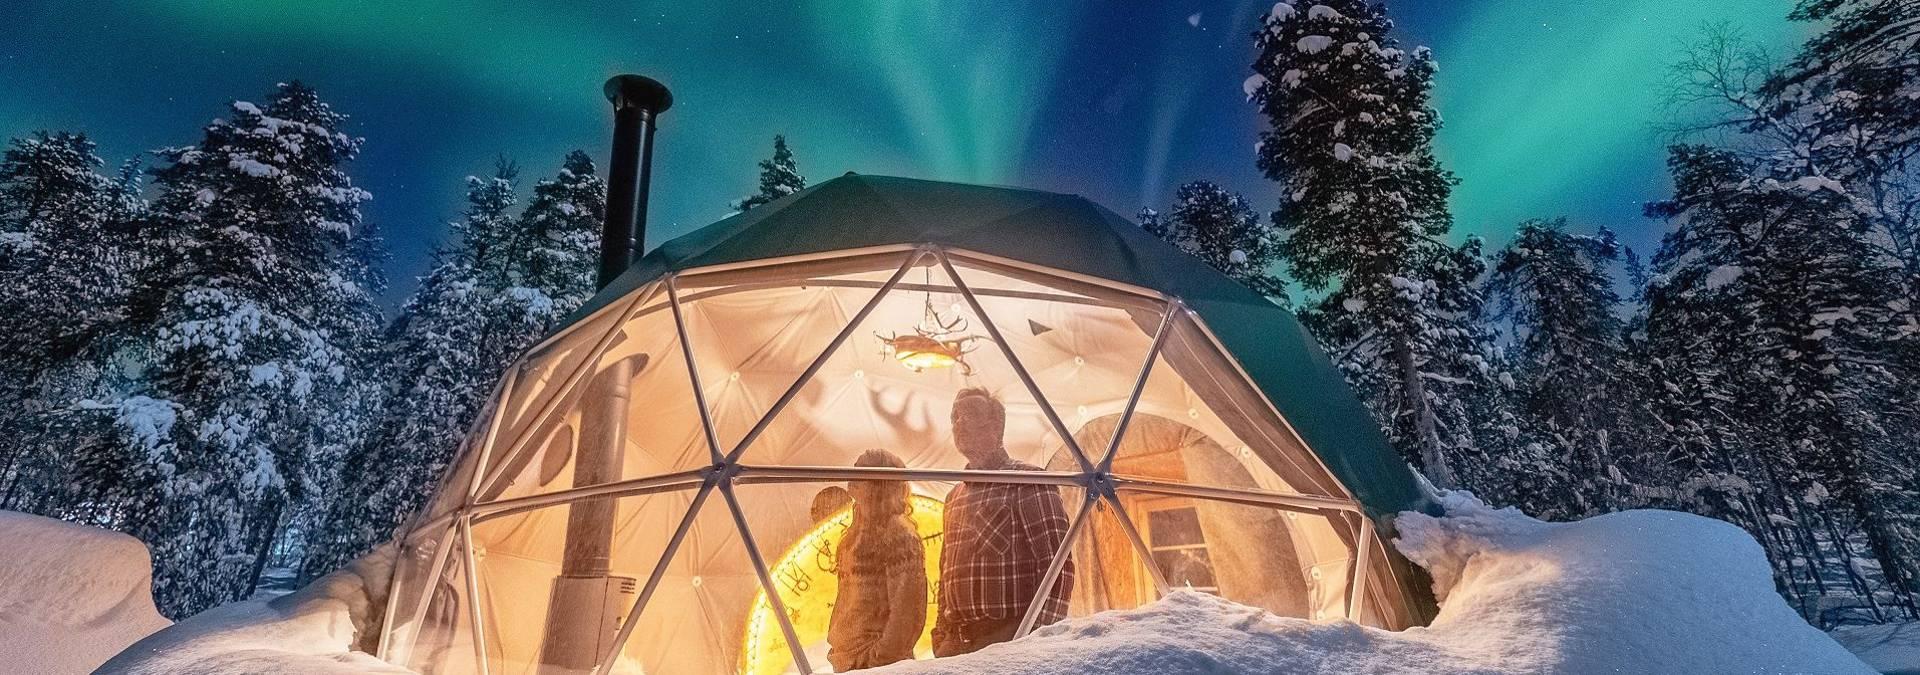 RESIZED Jeris_Dome-2 Credit Antti Pietikainen.jpg